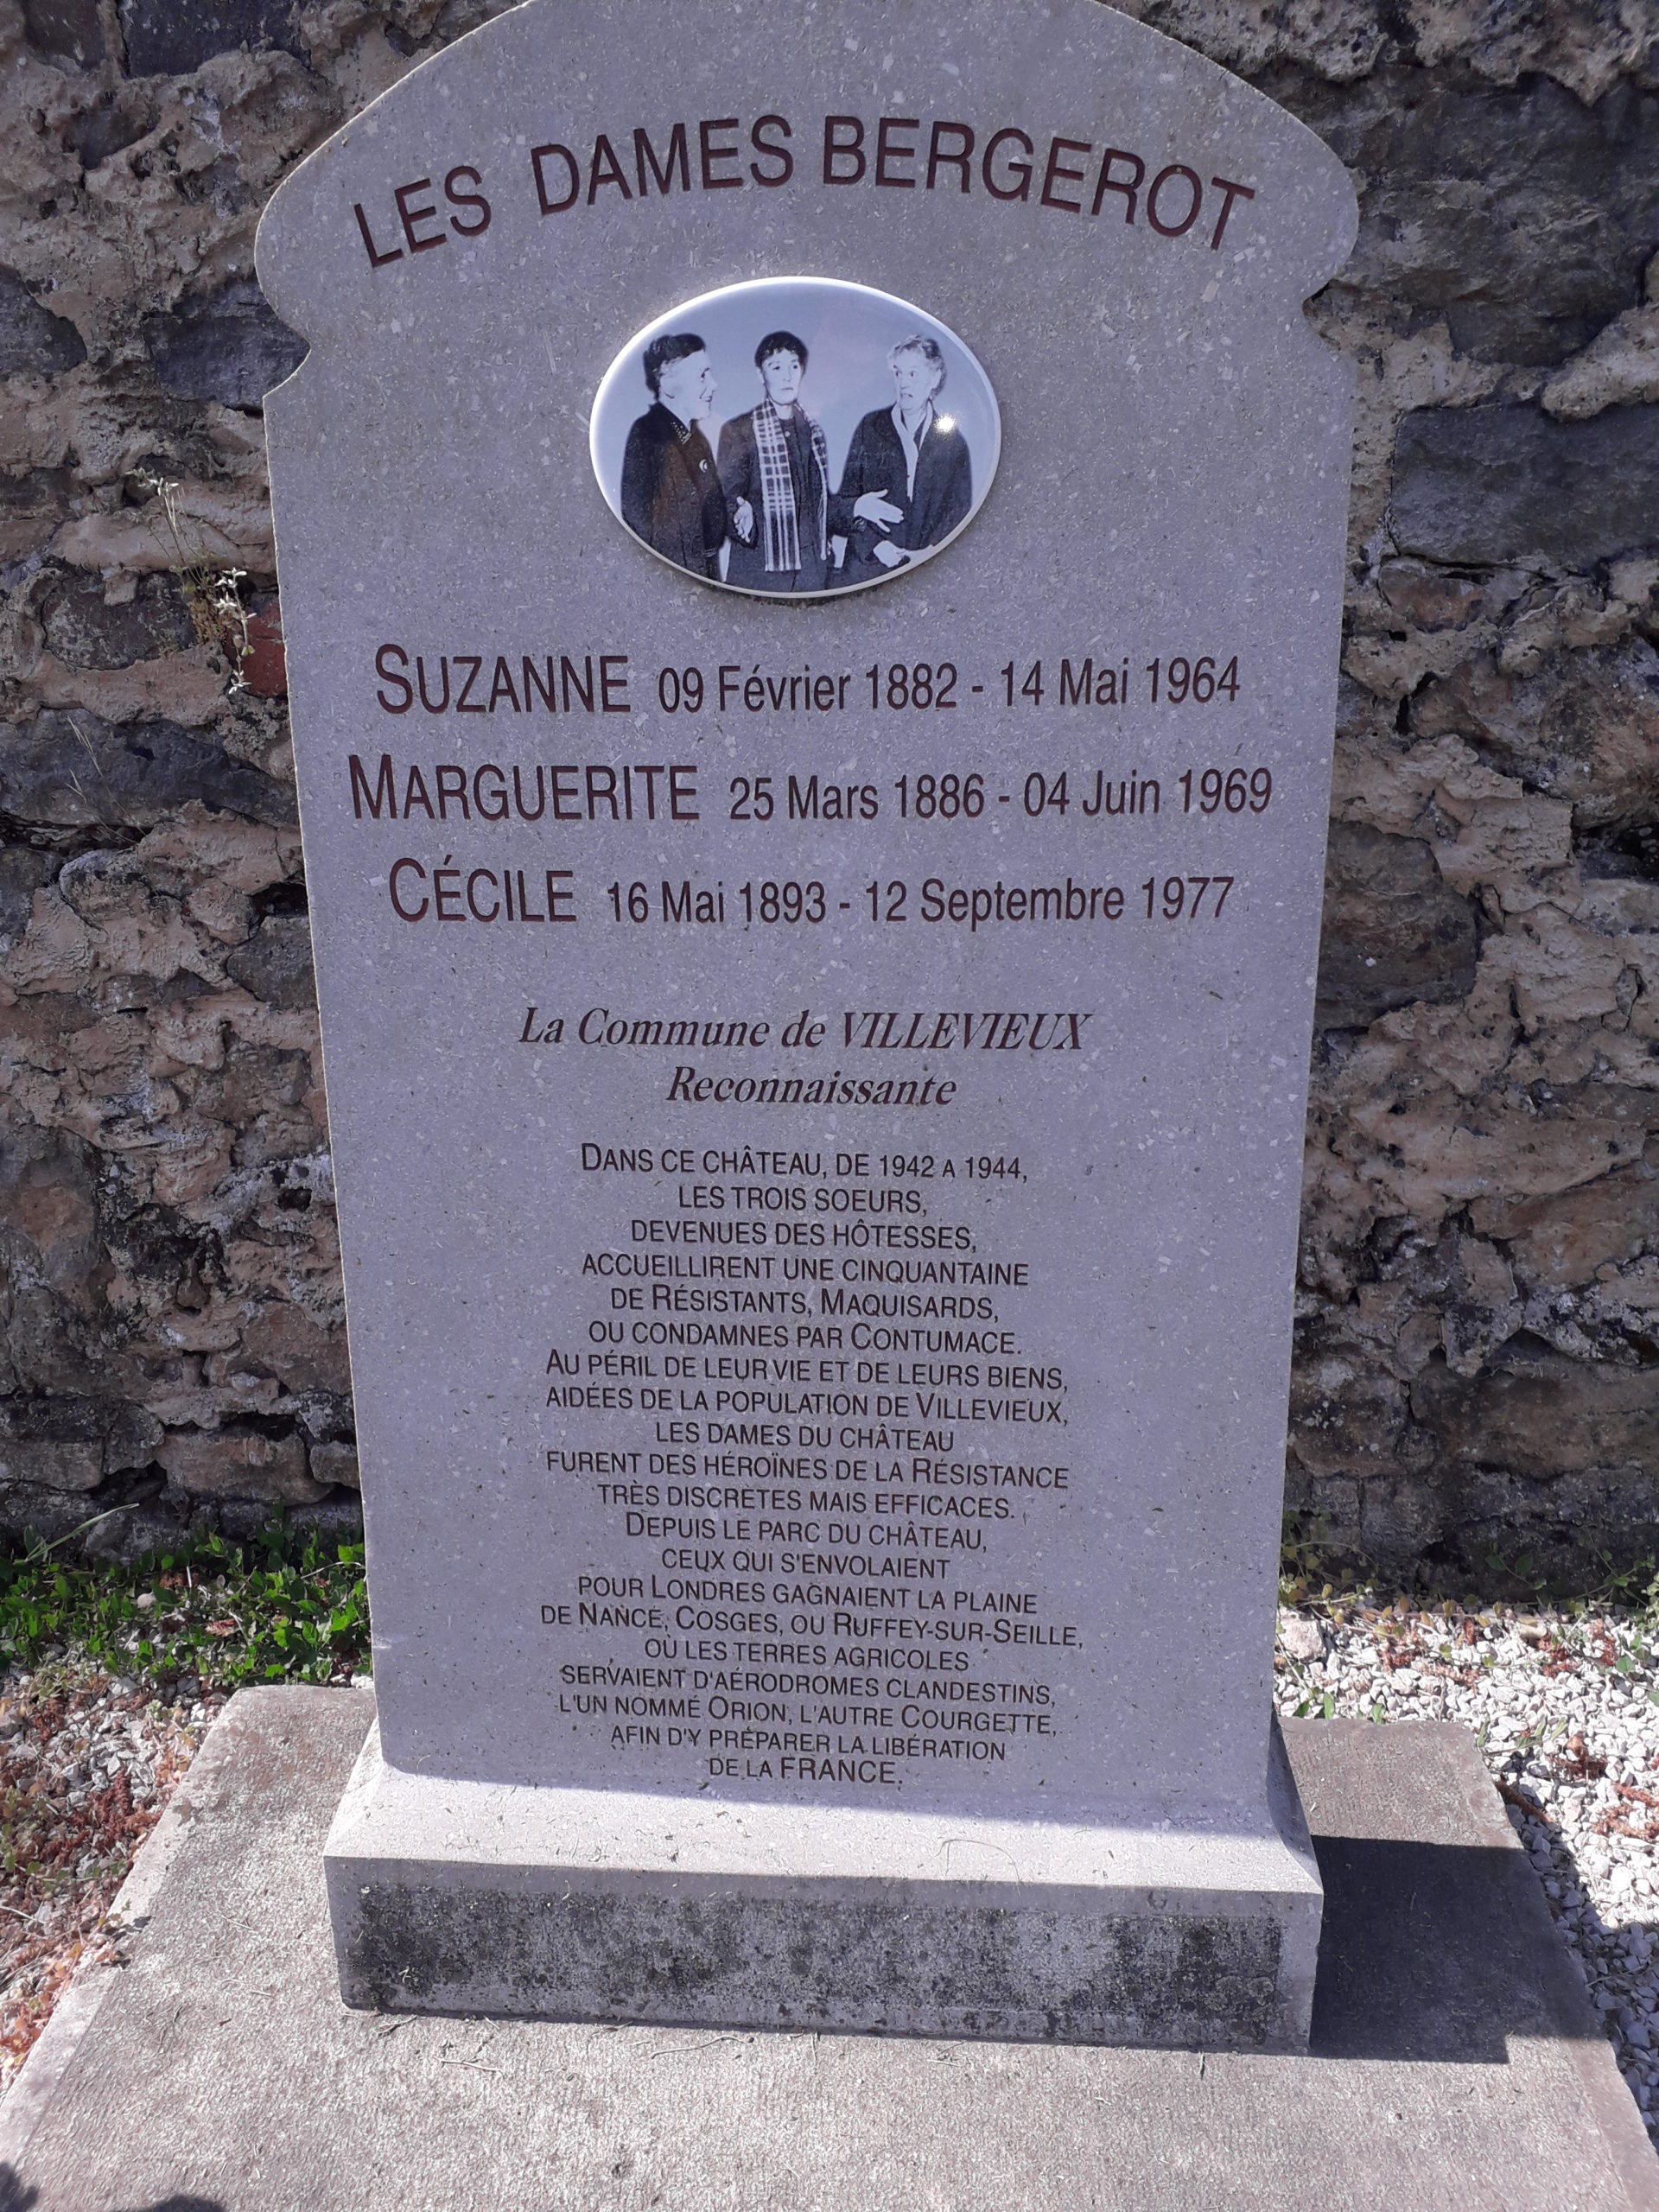 Monique Bergerot.